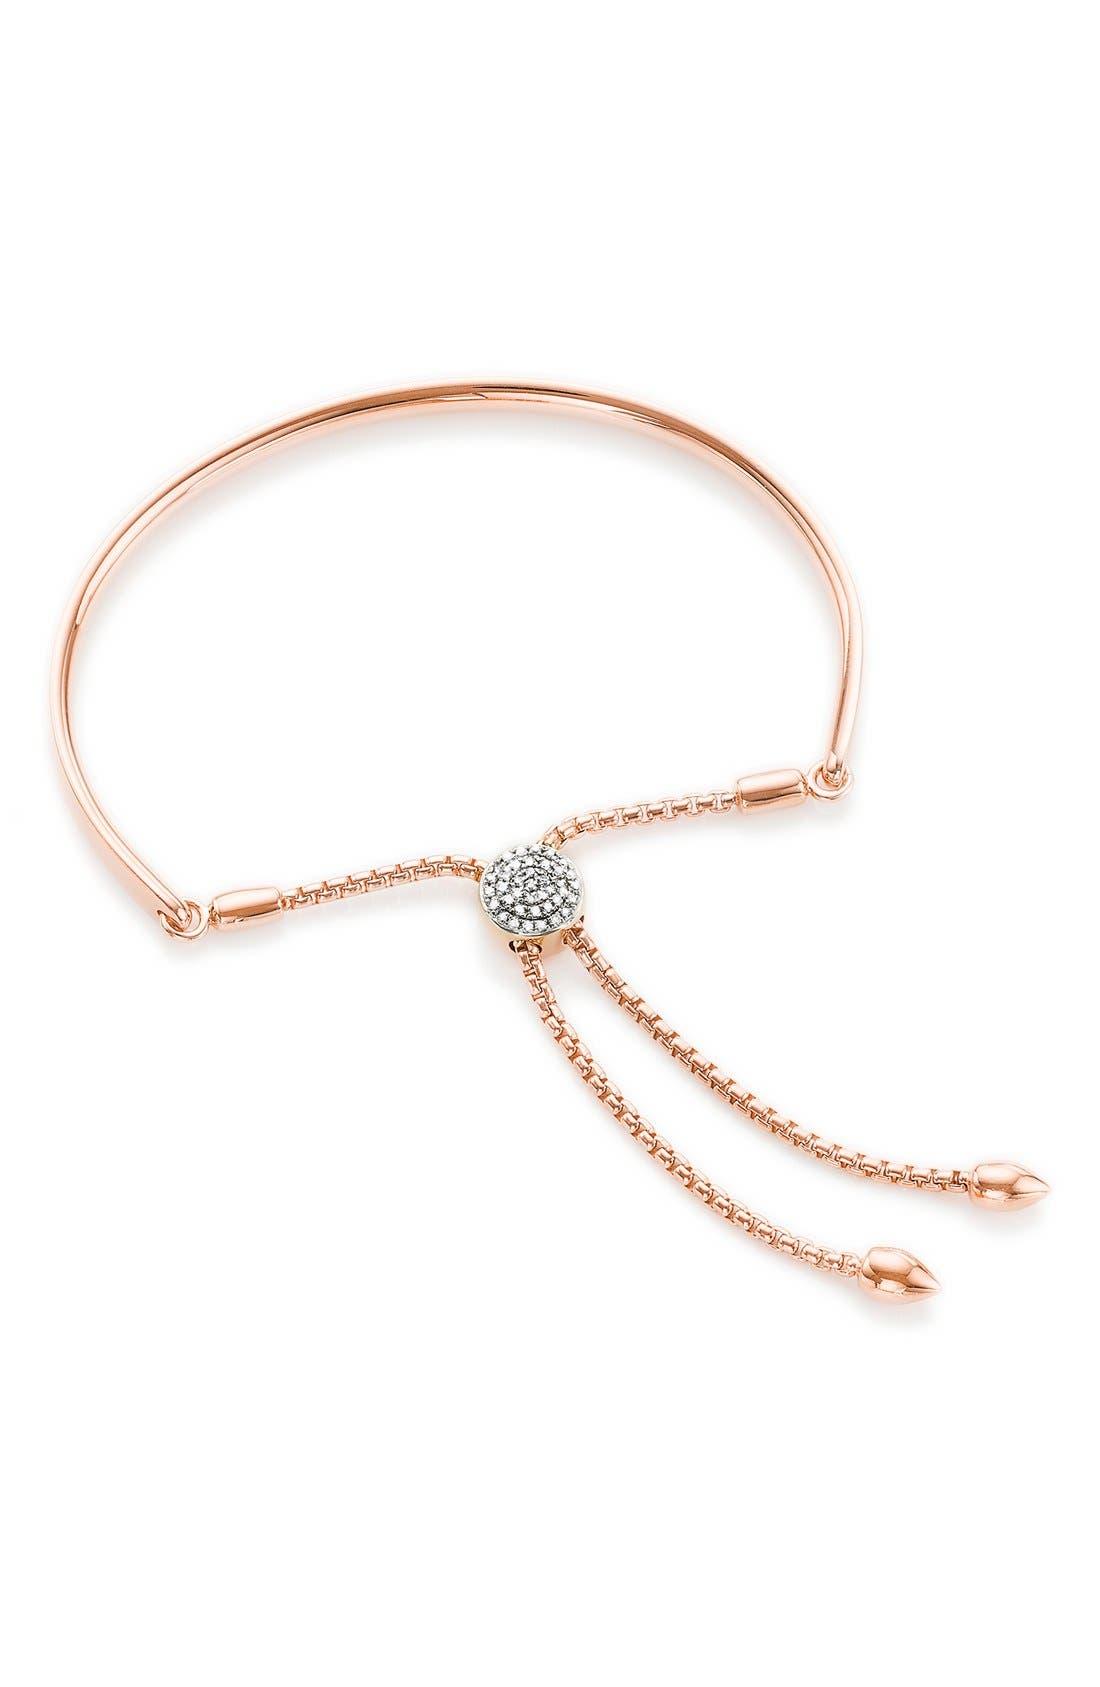 'Fiji' Diamond Friendship Bracelet,                         Main,                         color, ROSE GOLD/ DIAMOND